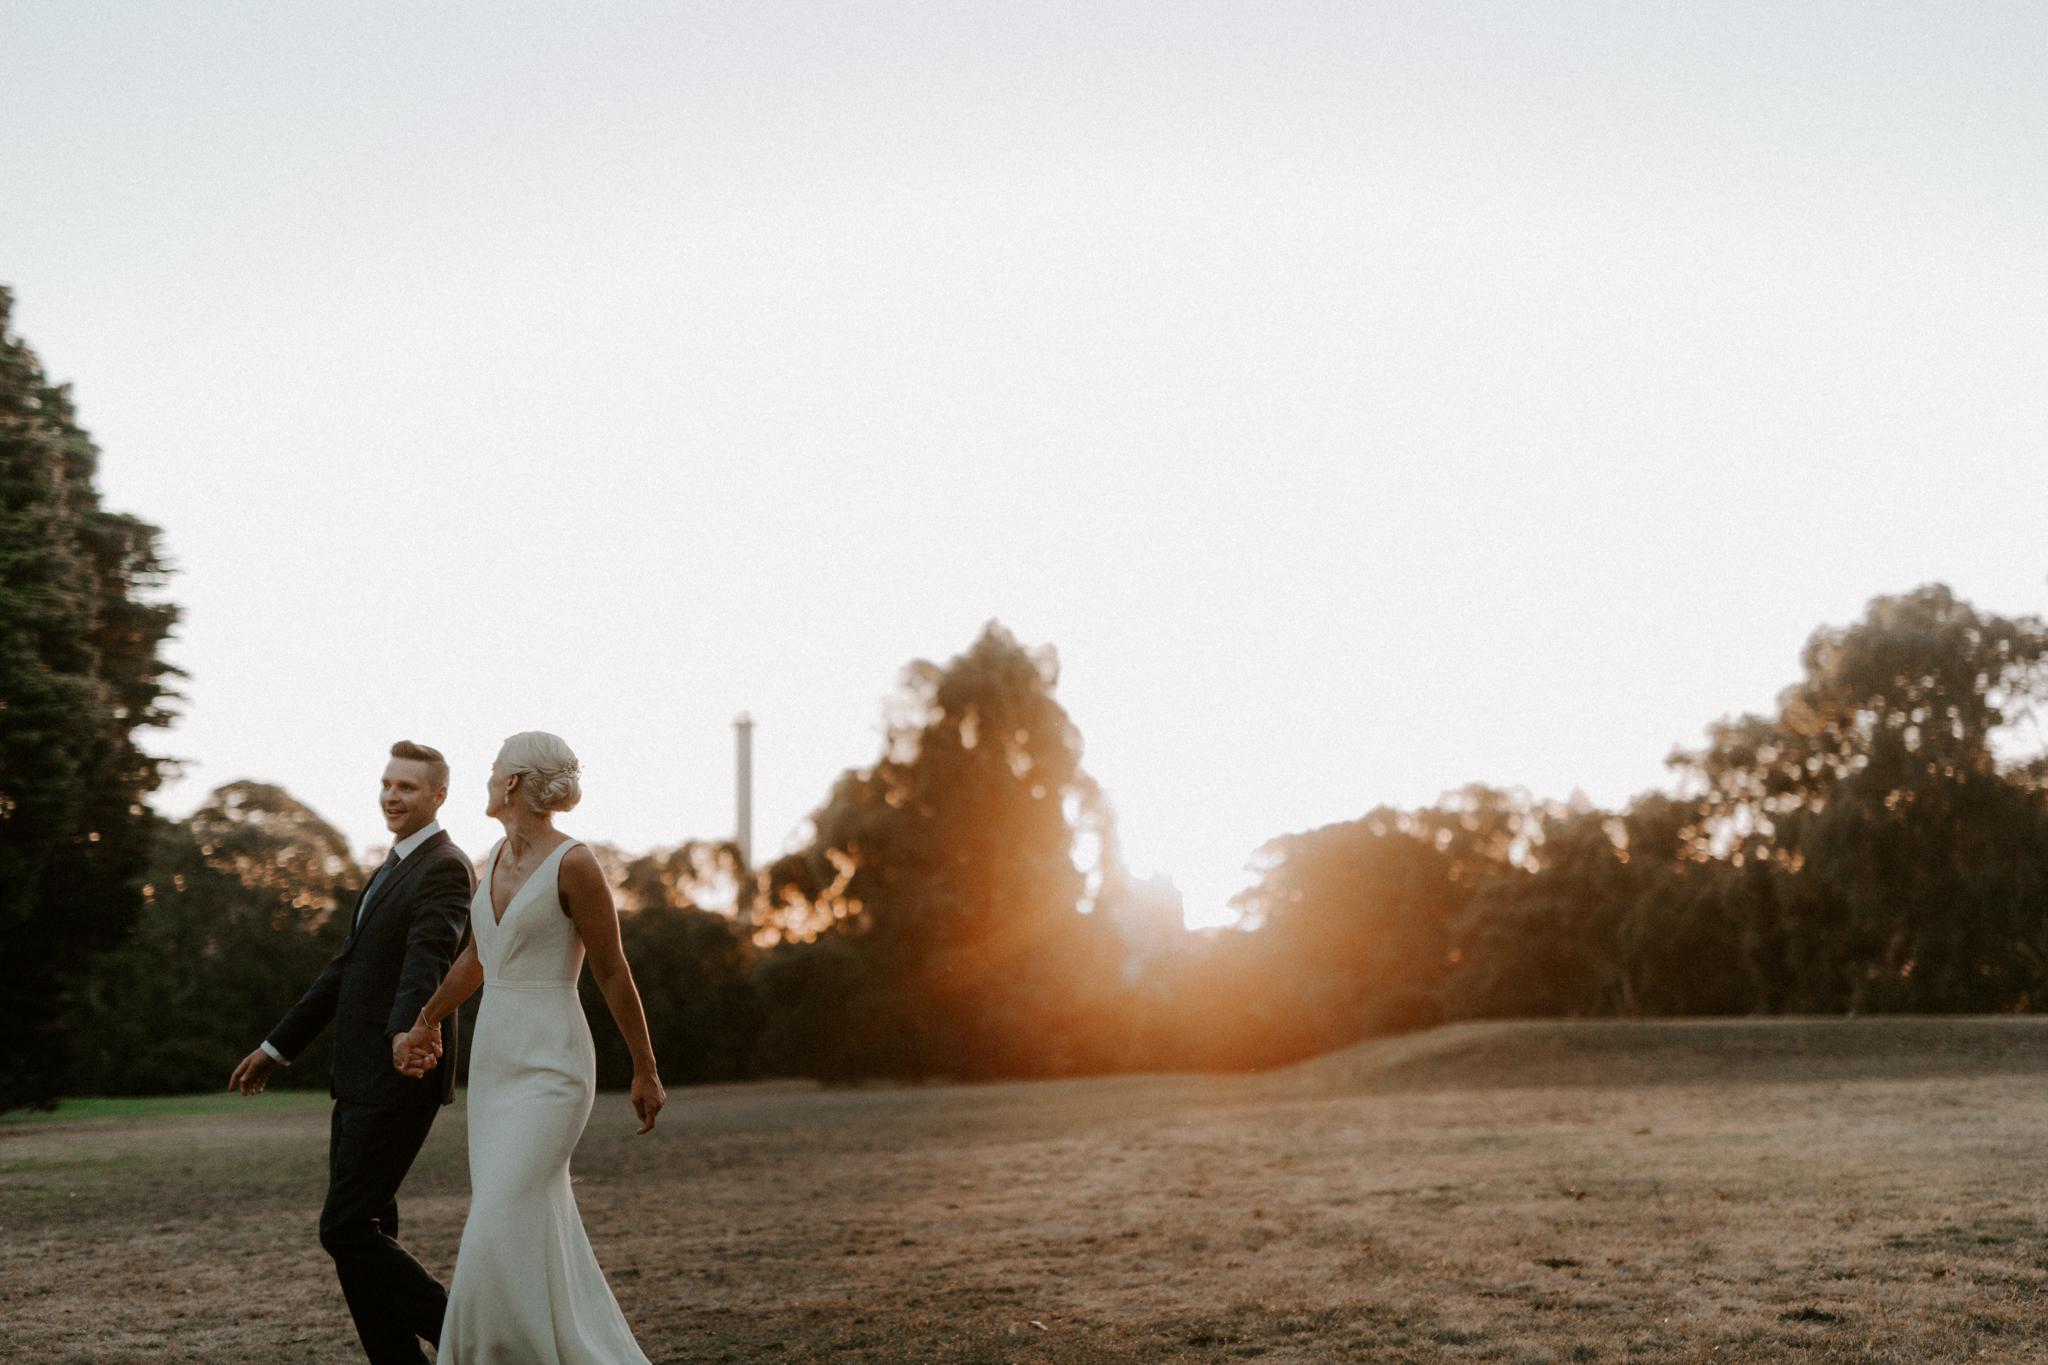 St-Kilda-Garden-Wedding-Emotions-and-Math-Photograph-241.jpg